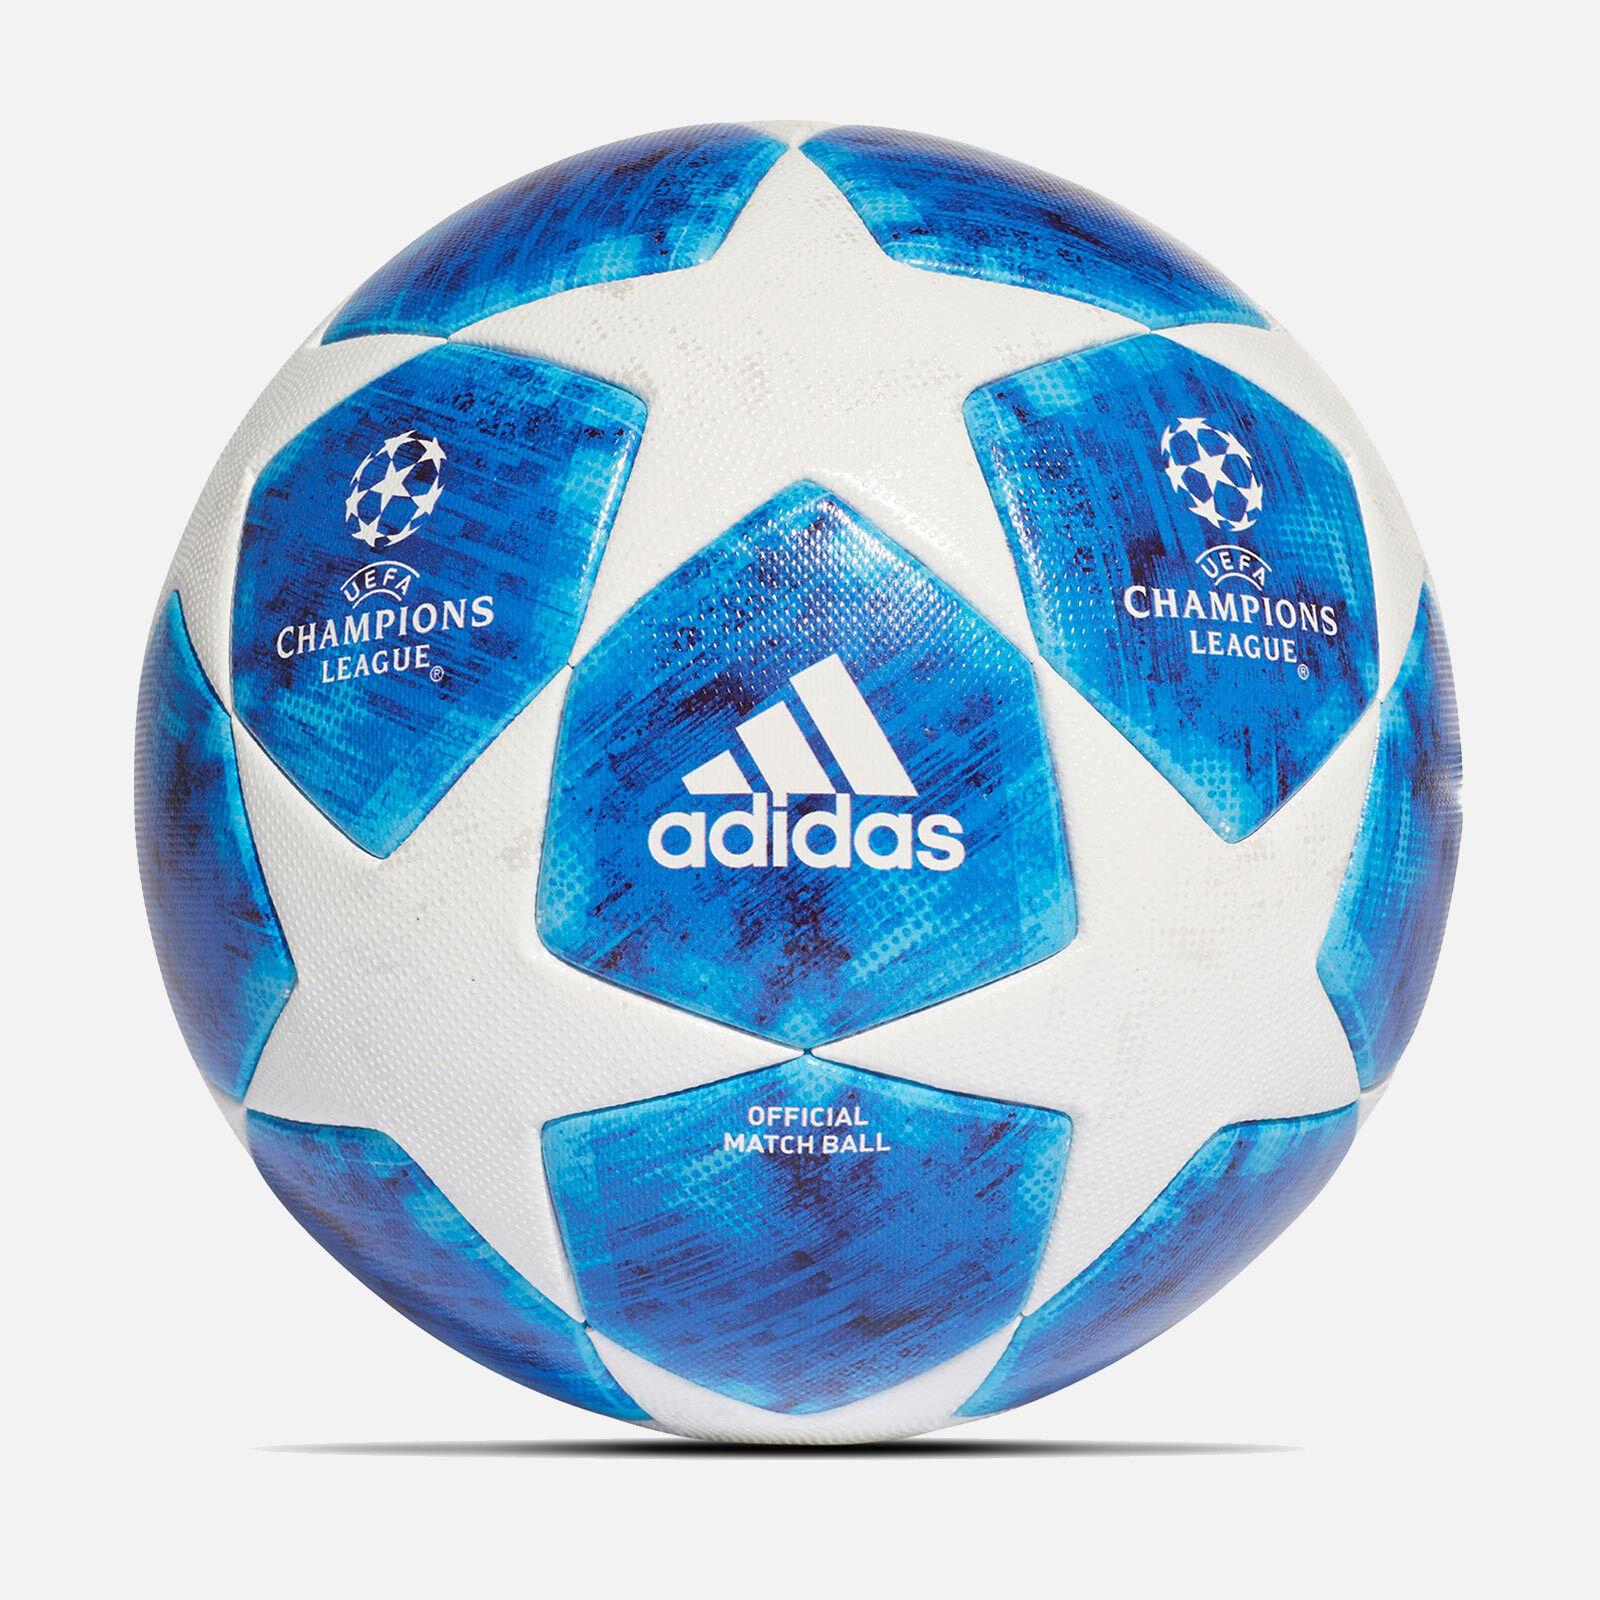 adidas finale 2014 uefa champions league match soccer ball lisbon 2014 for sale online ebay ebay